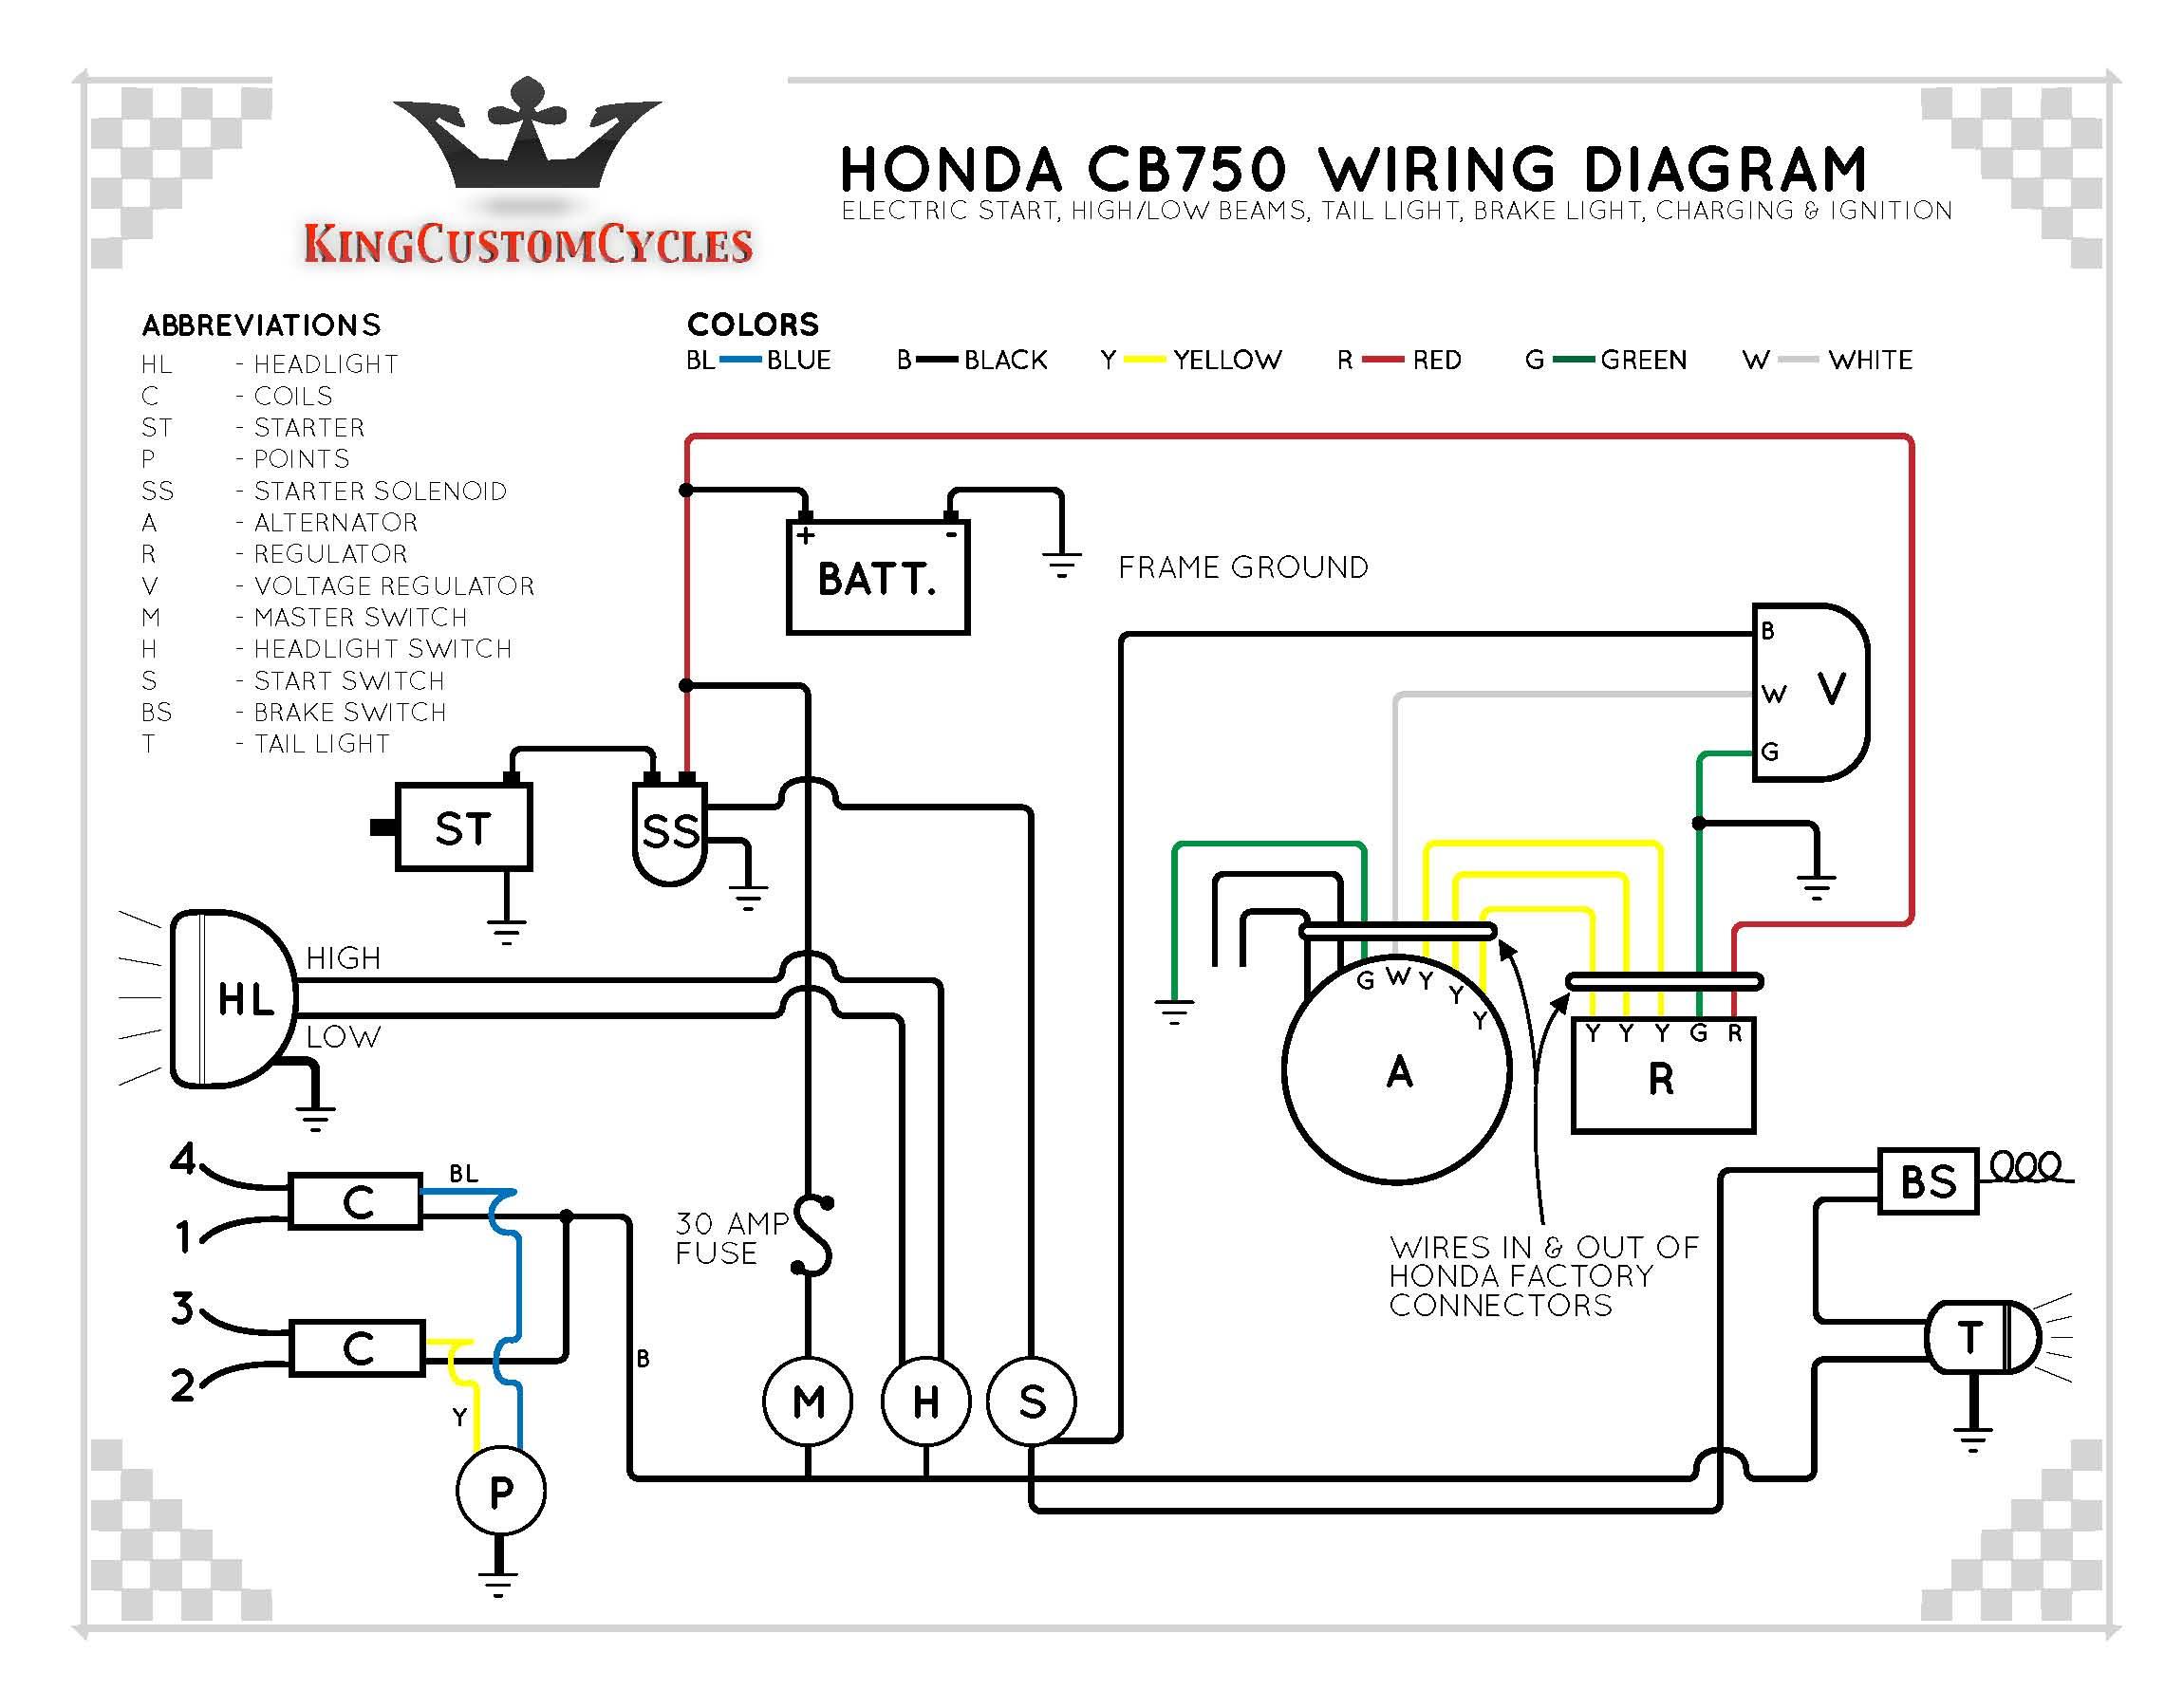 Cb750 Wiring Diagram Chopper - Great Installation Of Wiring Diagram • - Cb750 Wiring Diagram